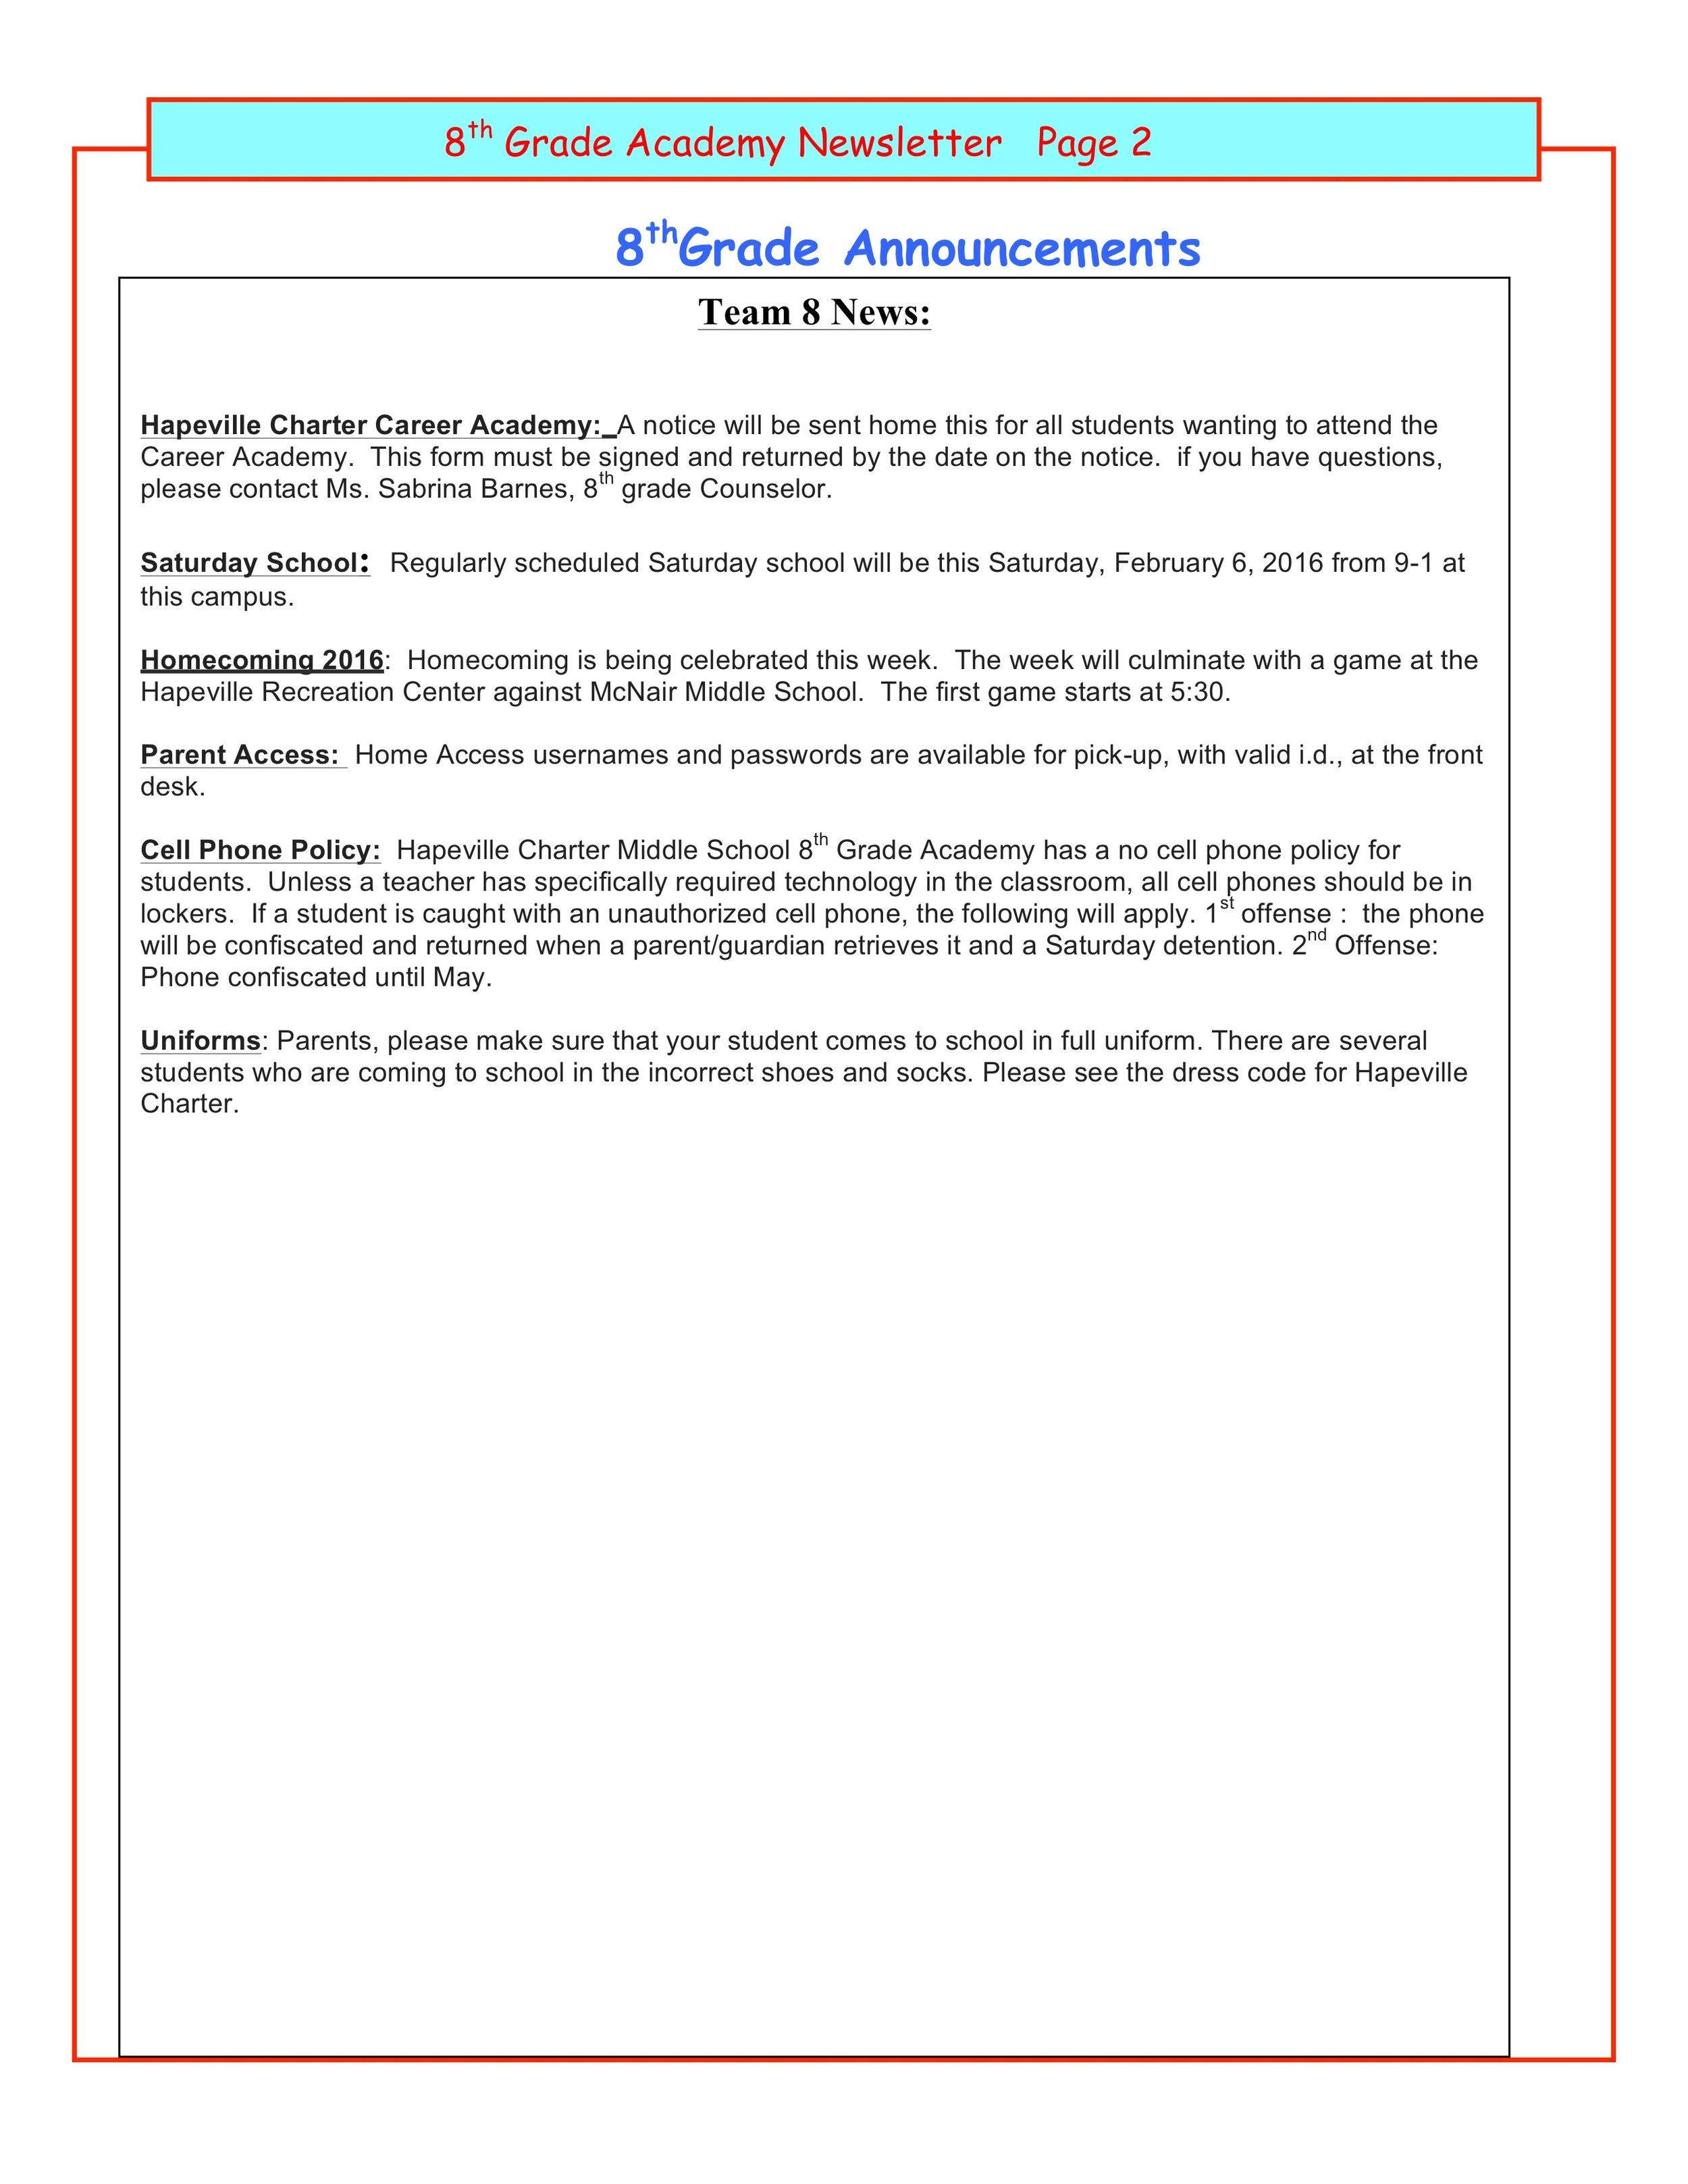 Newsletter Image8th-grade-2-1-2016 2.jpeg